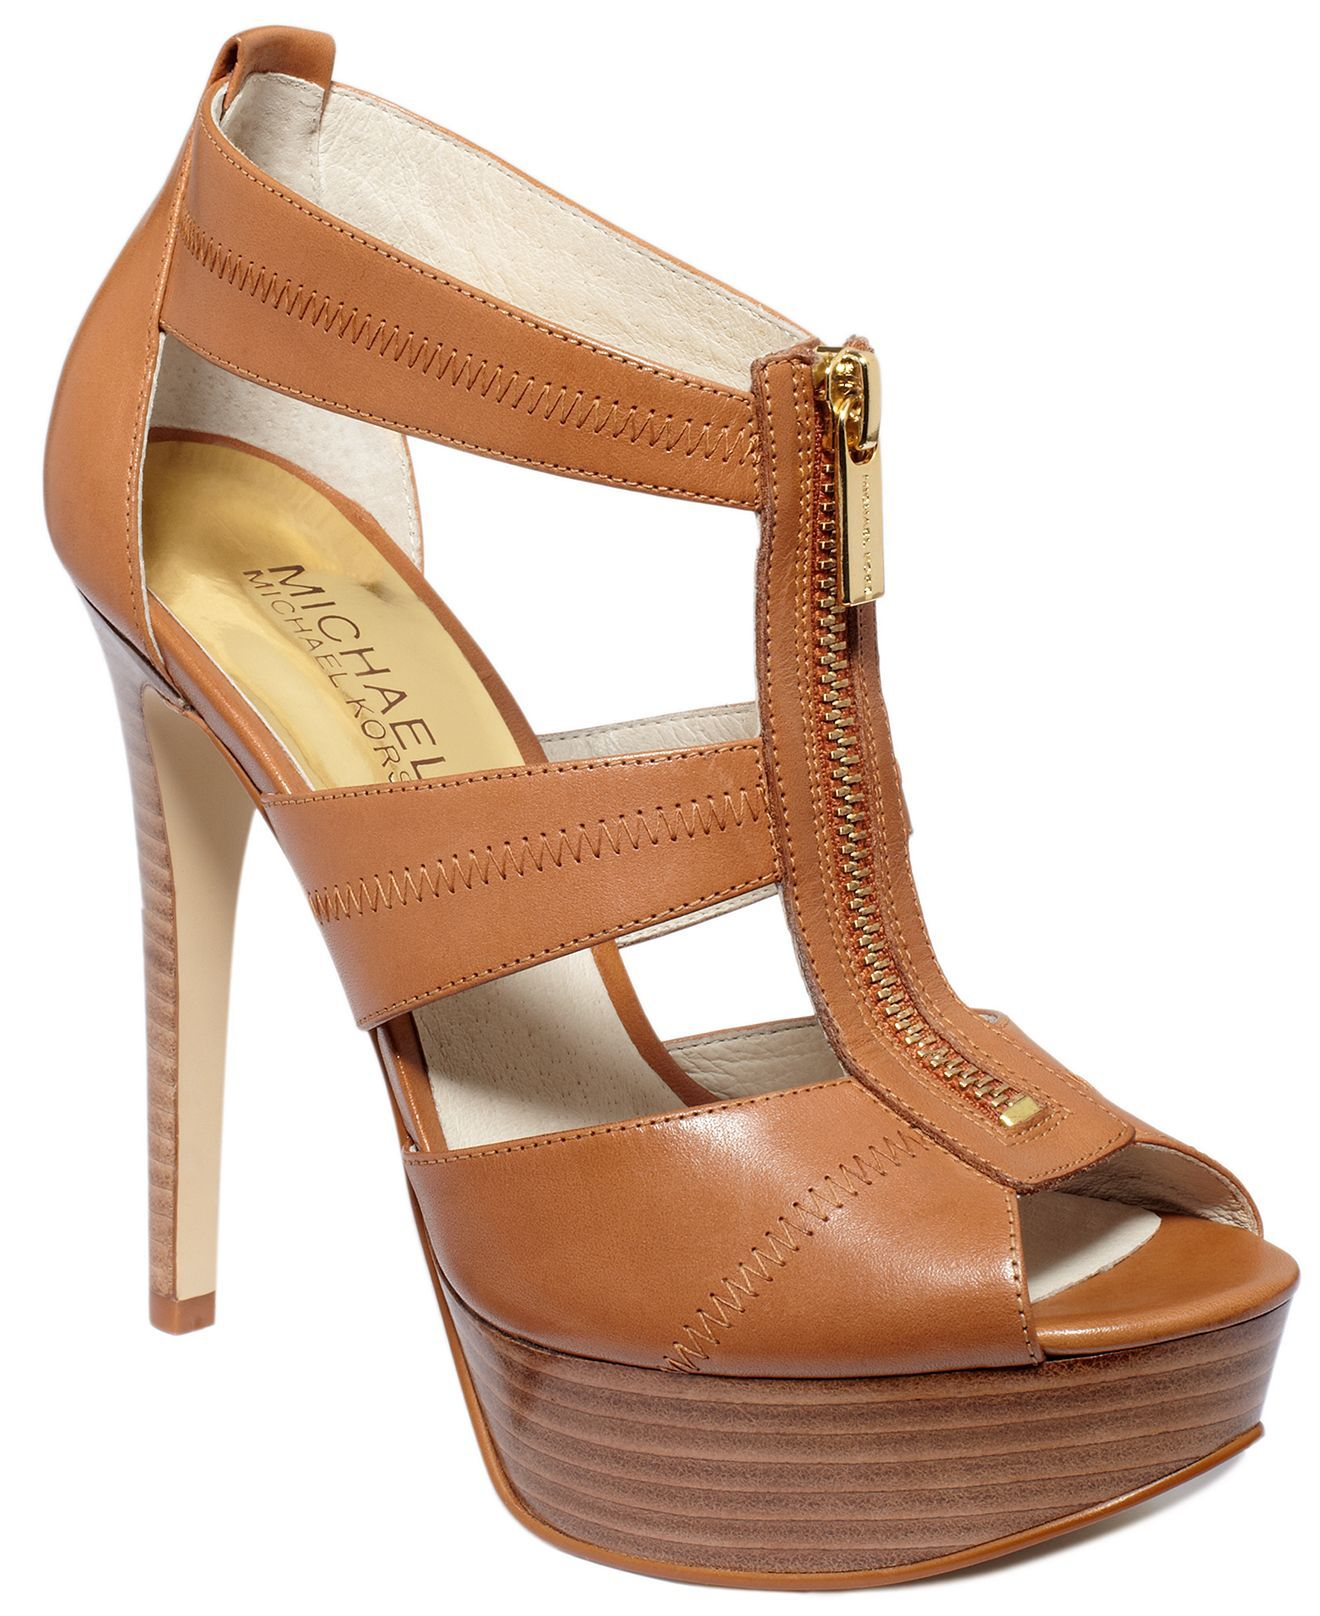 5d79298fb51 MICHAEL Michael Kors Berkley Platform Sandals - Shoes - Macy s